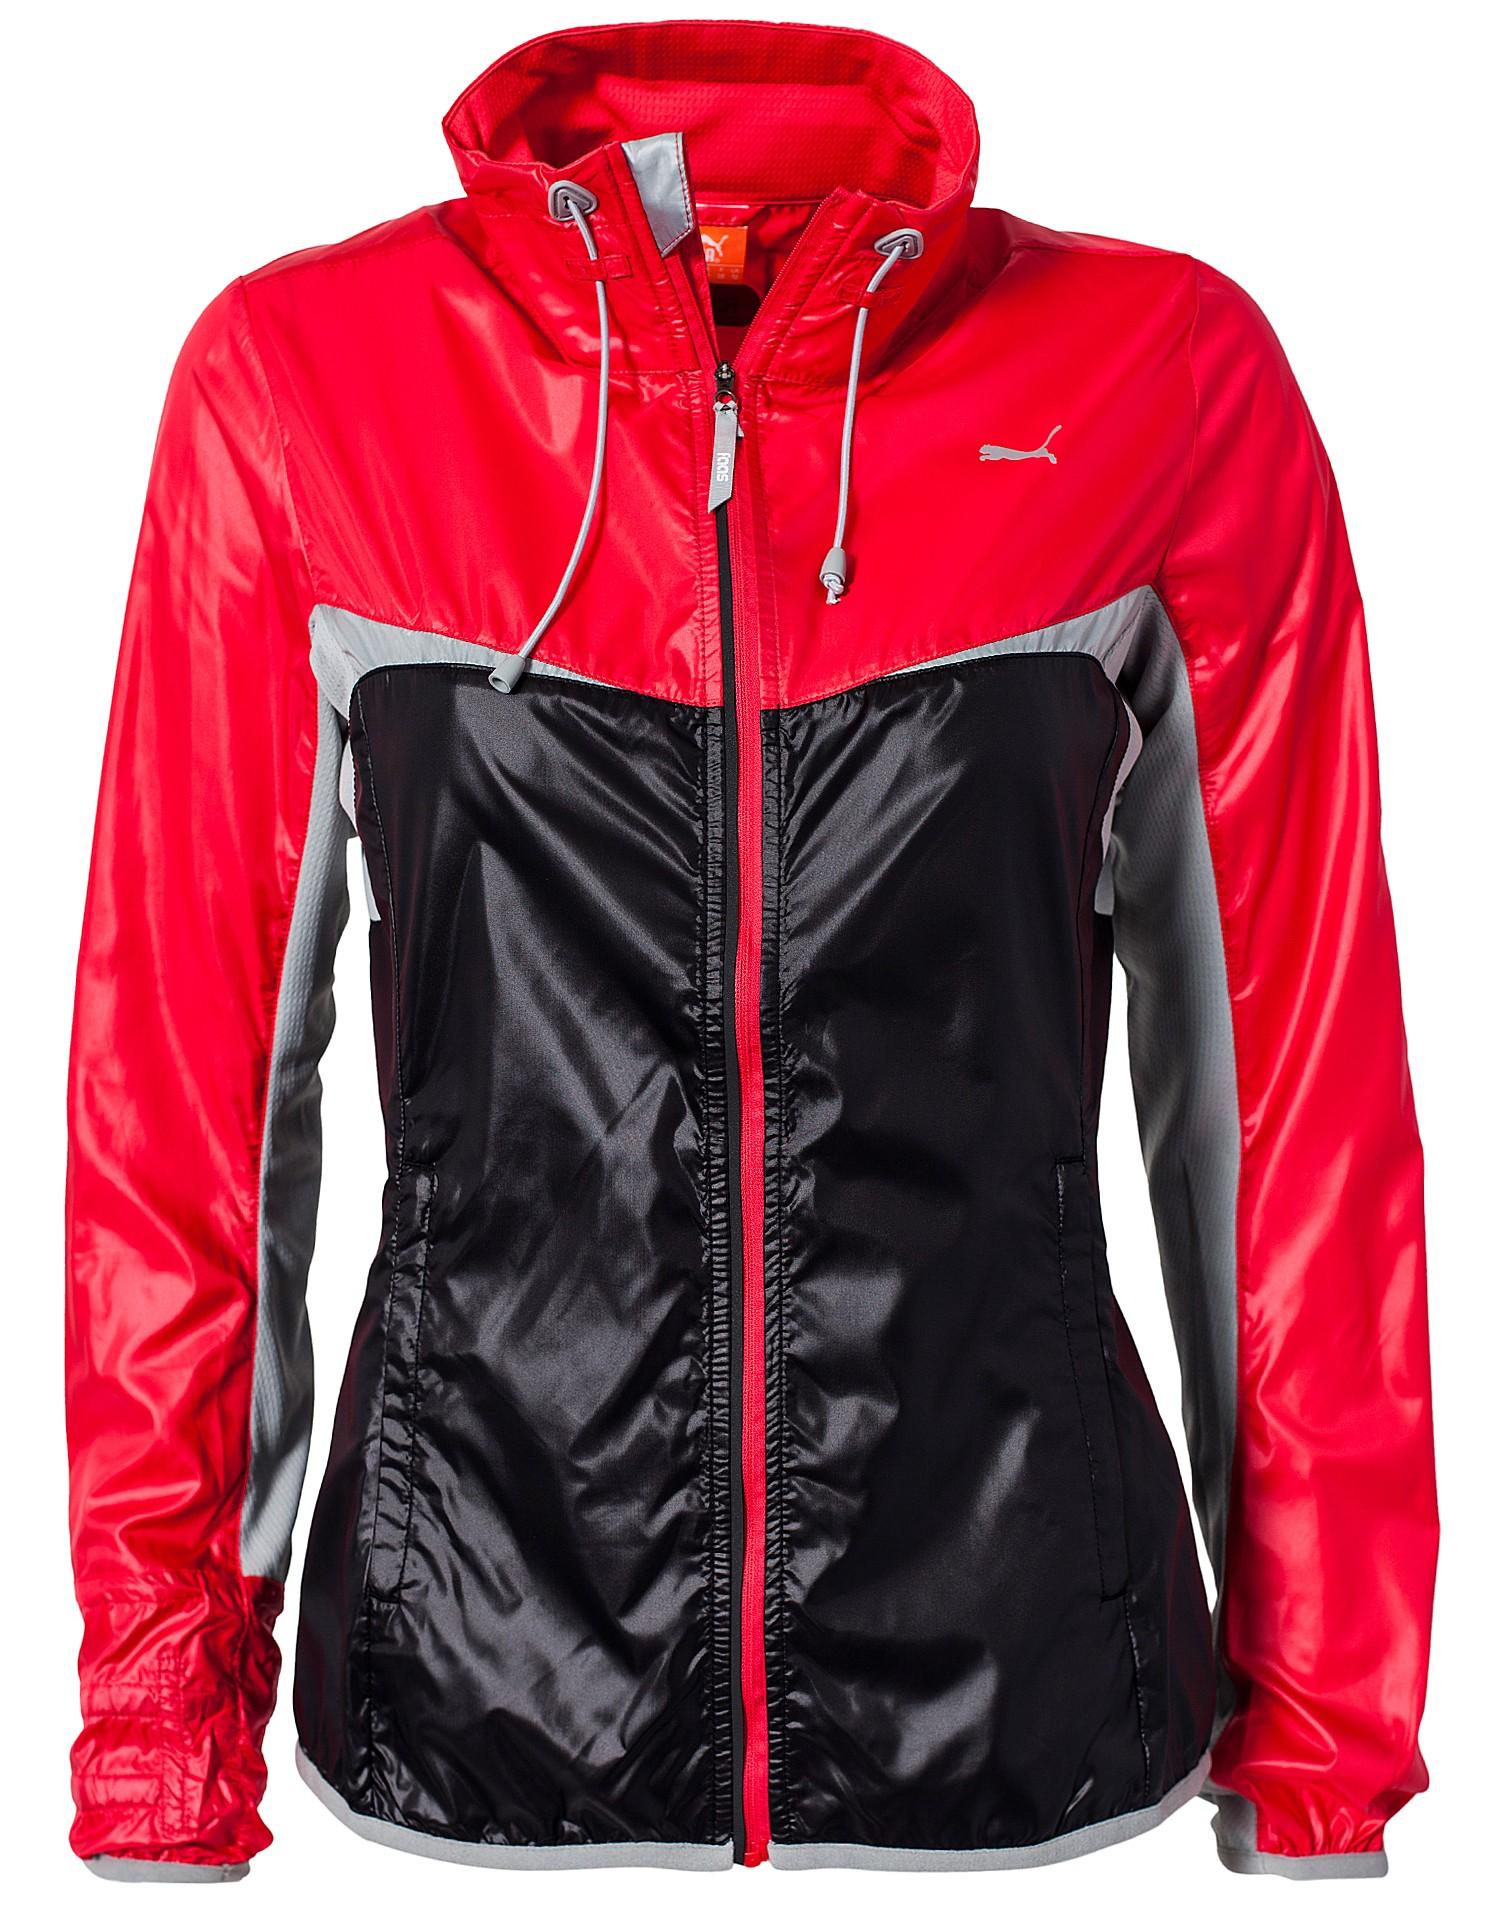 Black and Red Shiny Puma Jacket